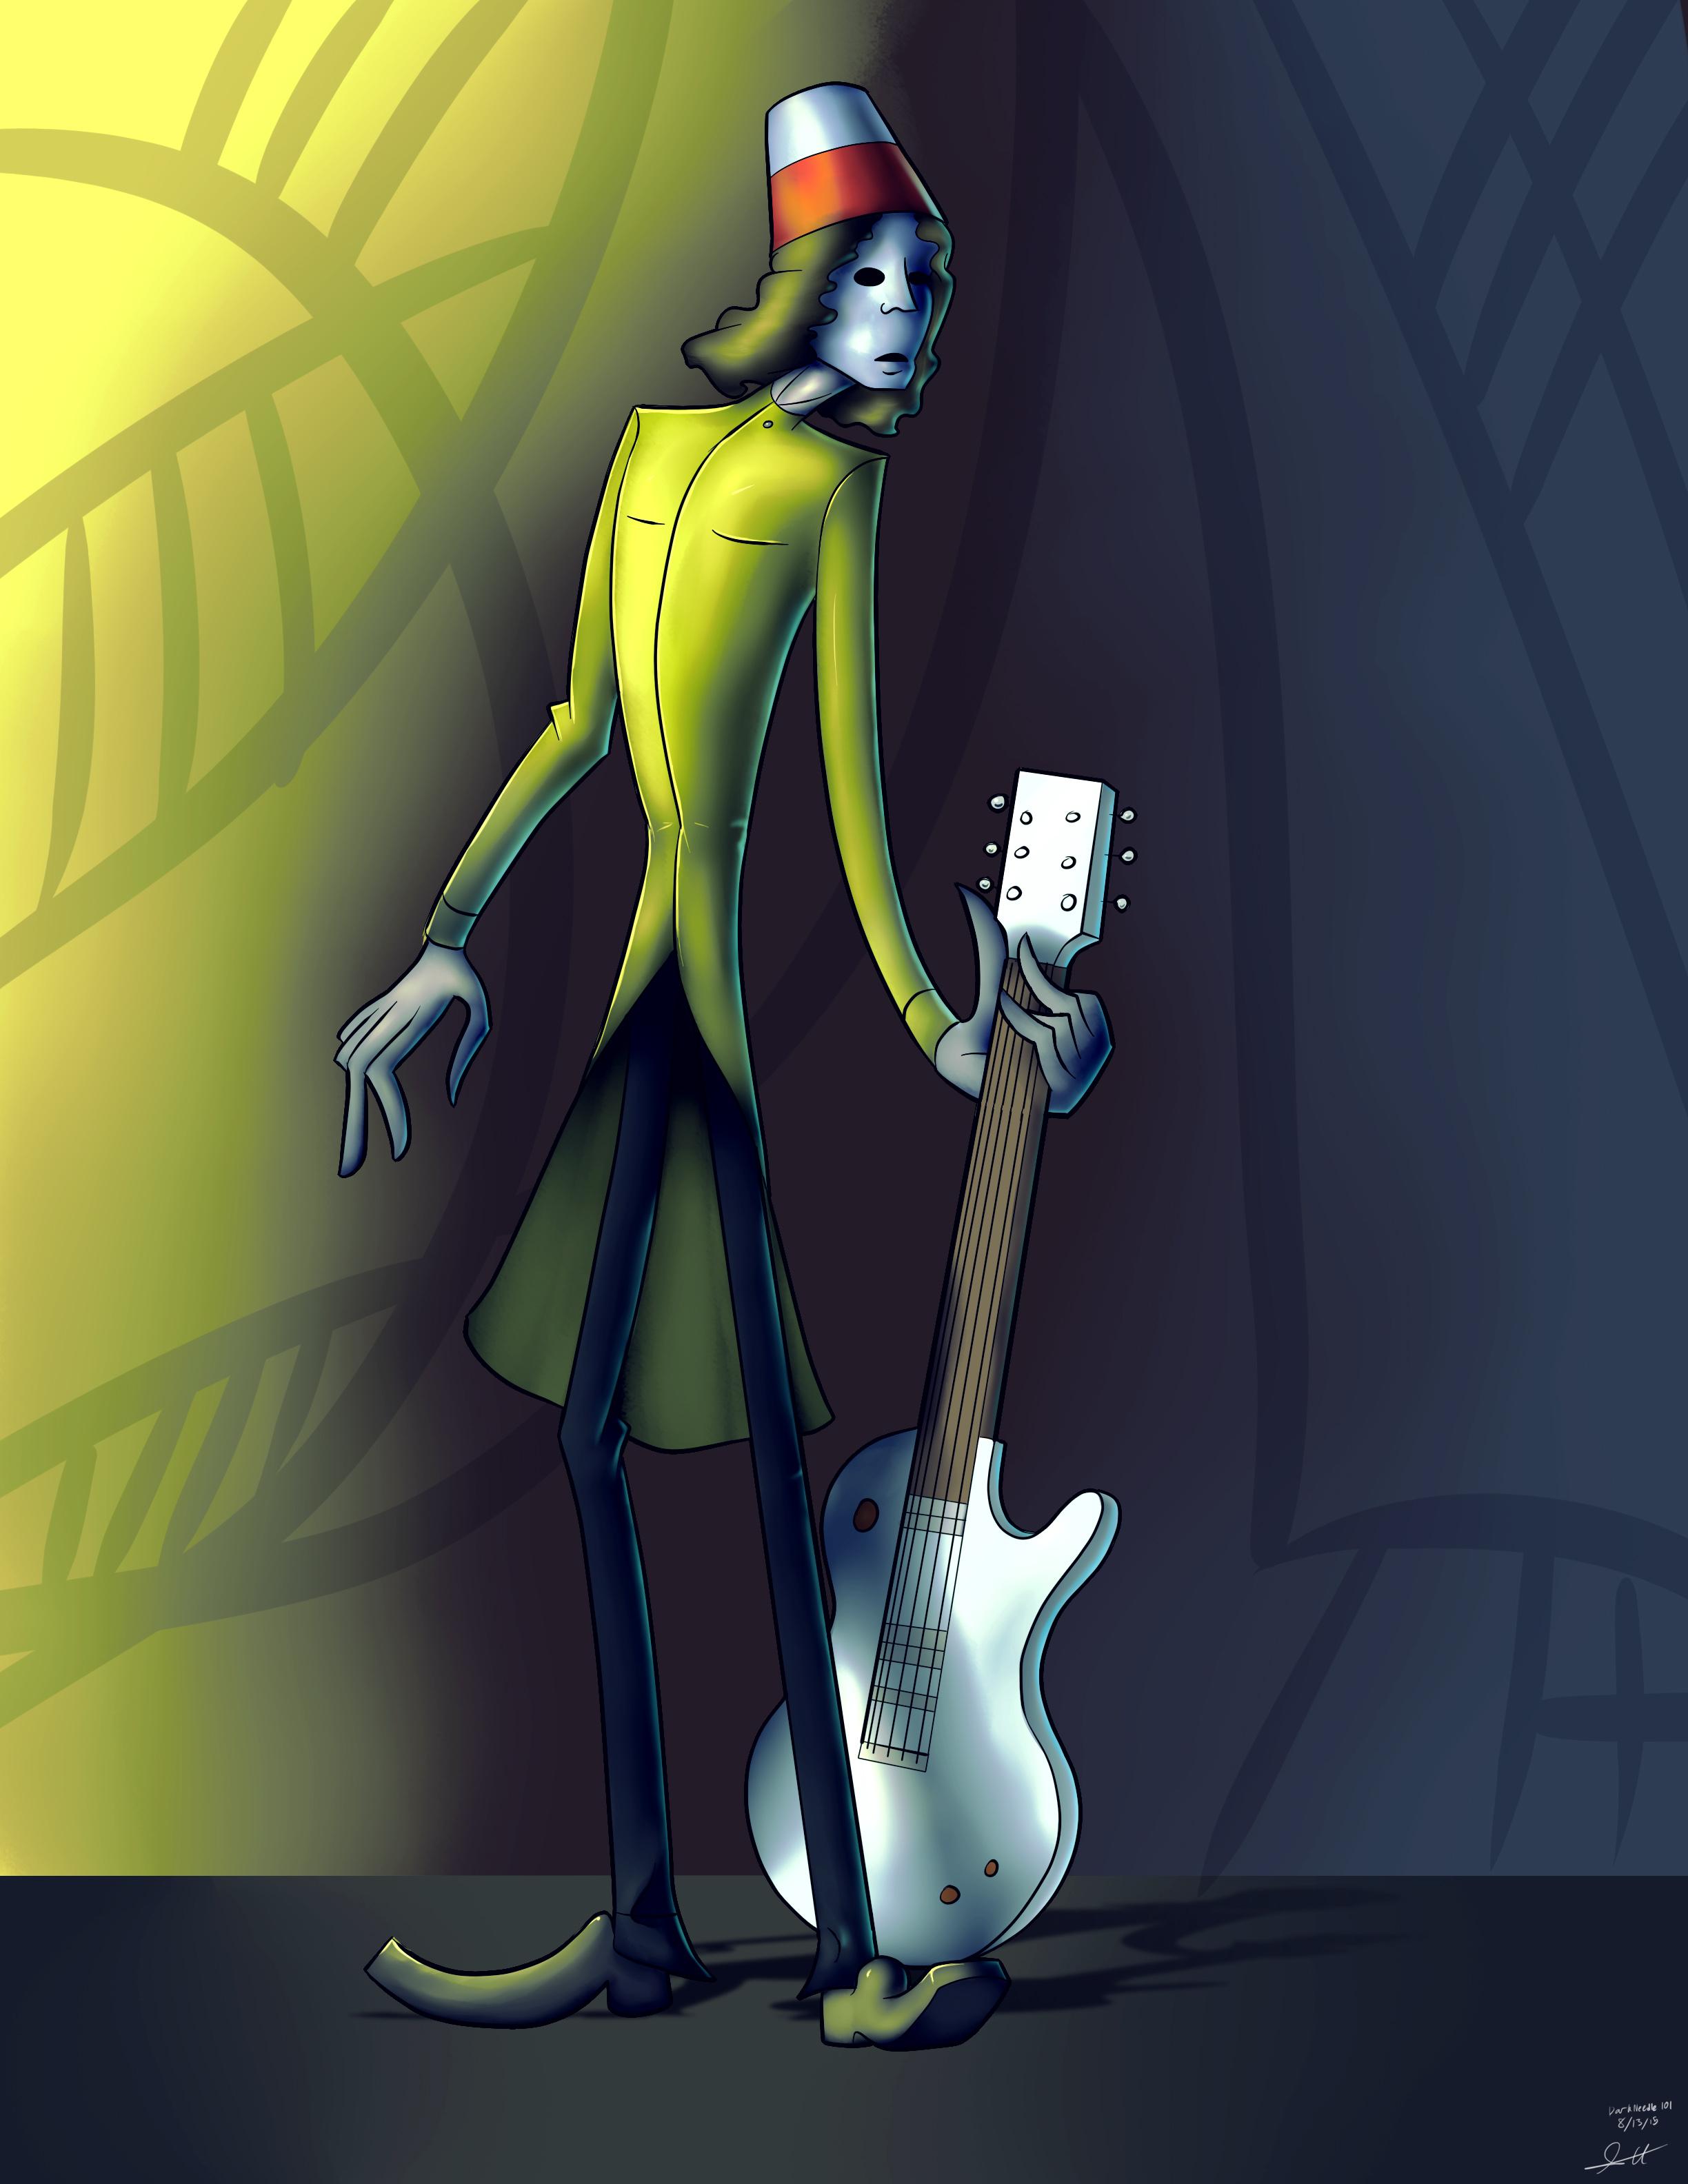 Character: Buckethead